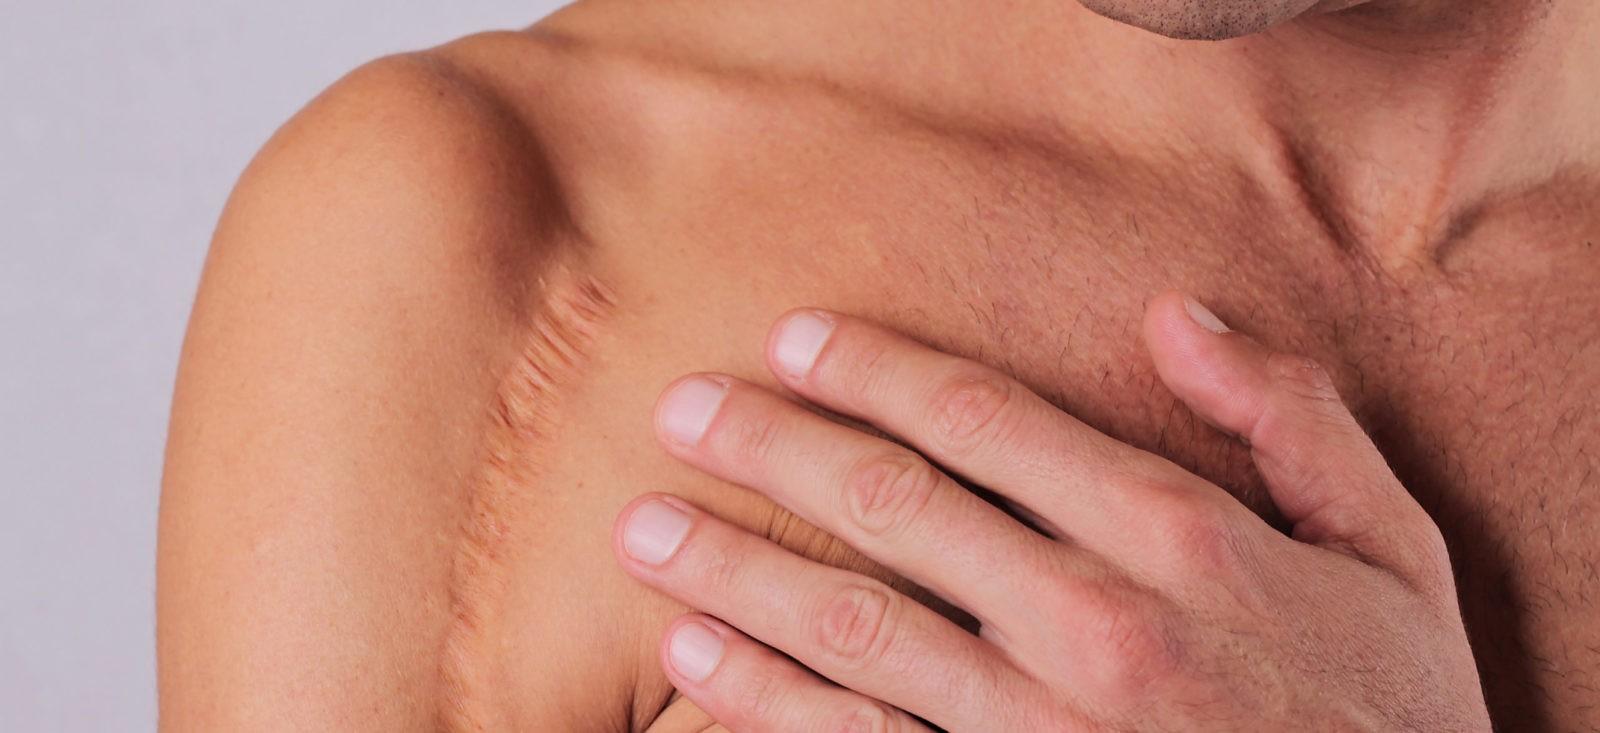 man with large shoulder mark seeking scar reduction